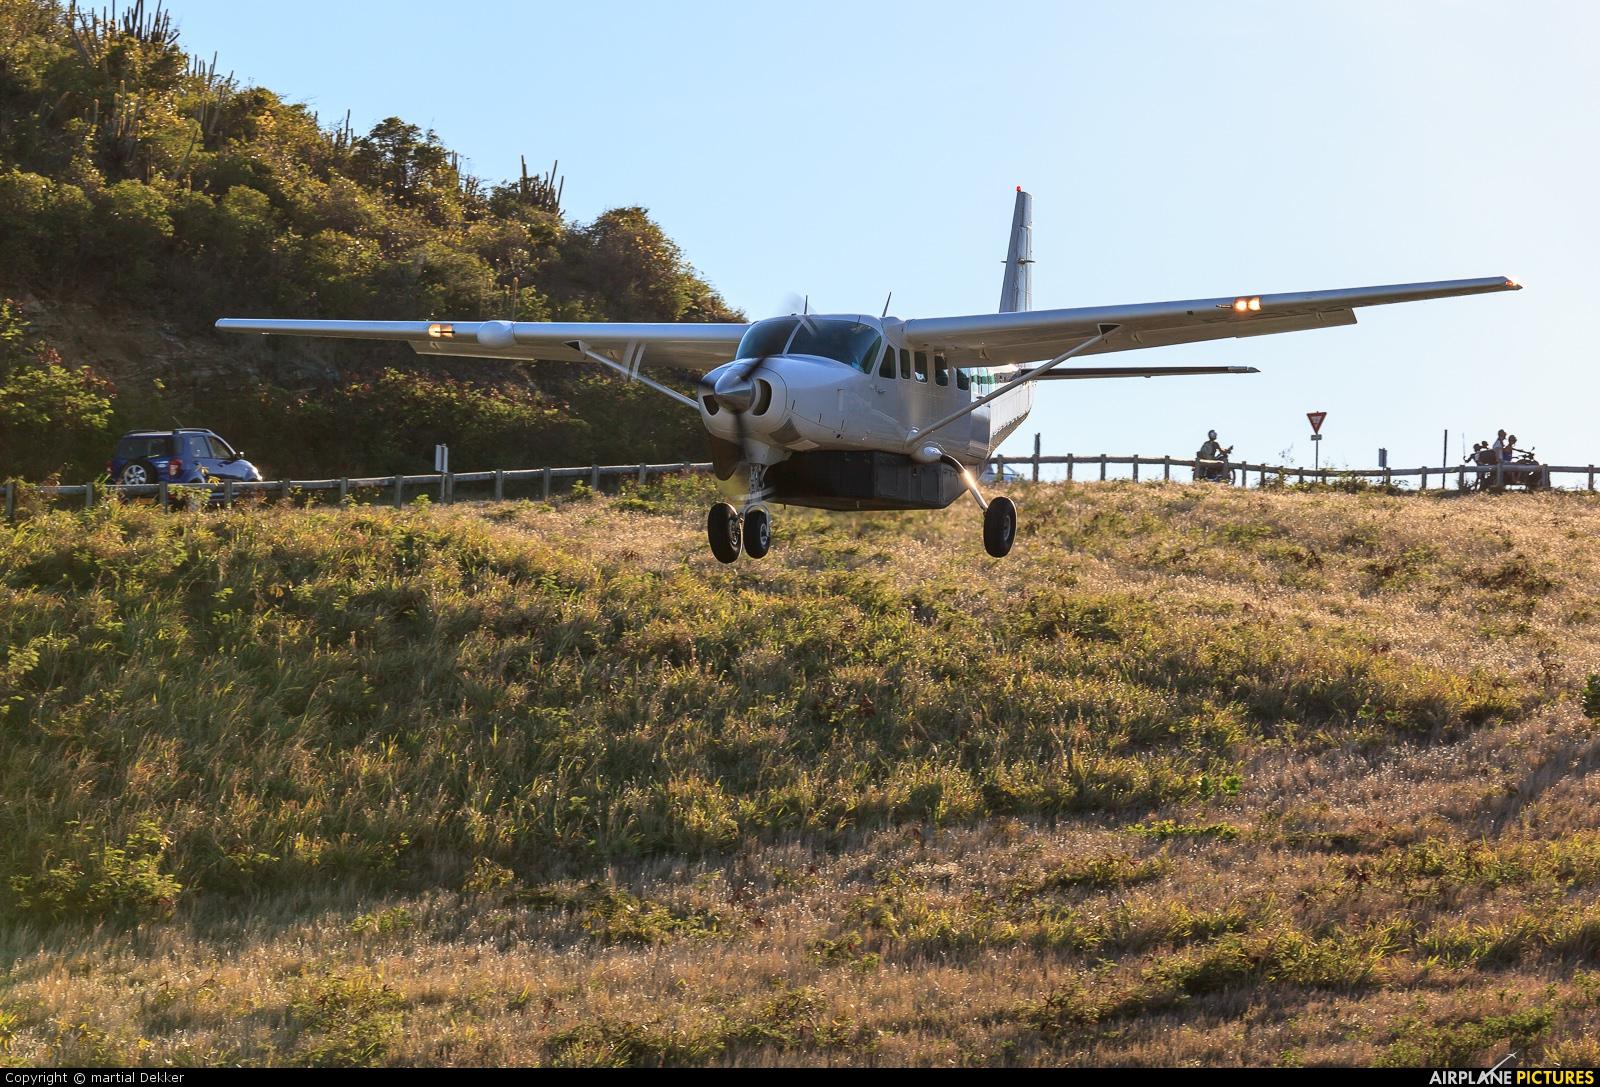 Air Antilles Express F-OHQN aircraft at Saint-Barthélemy - Gustaf III